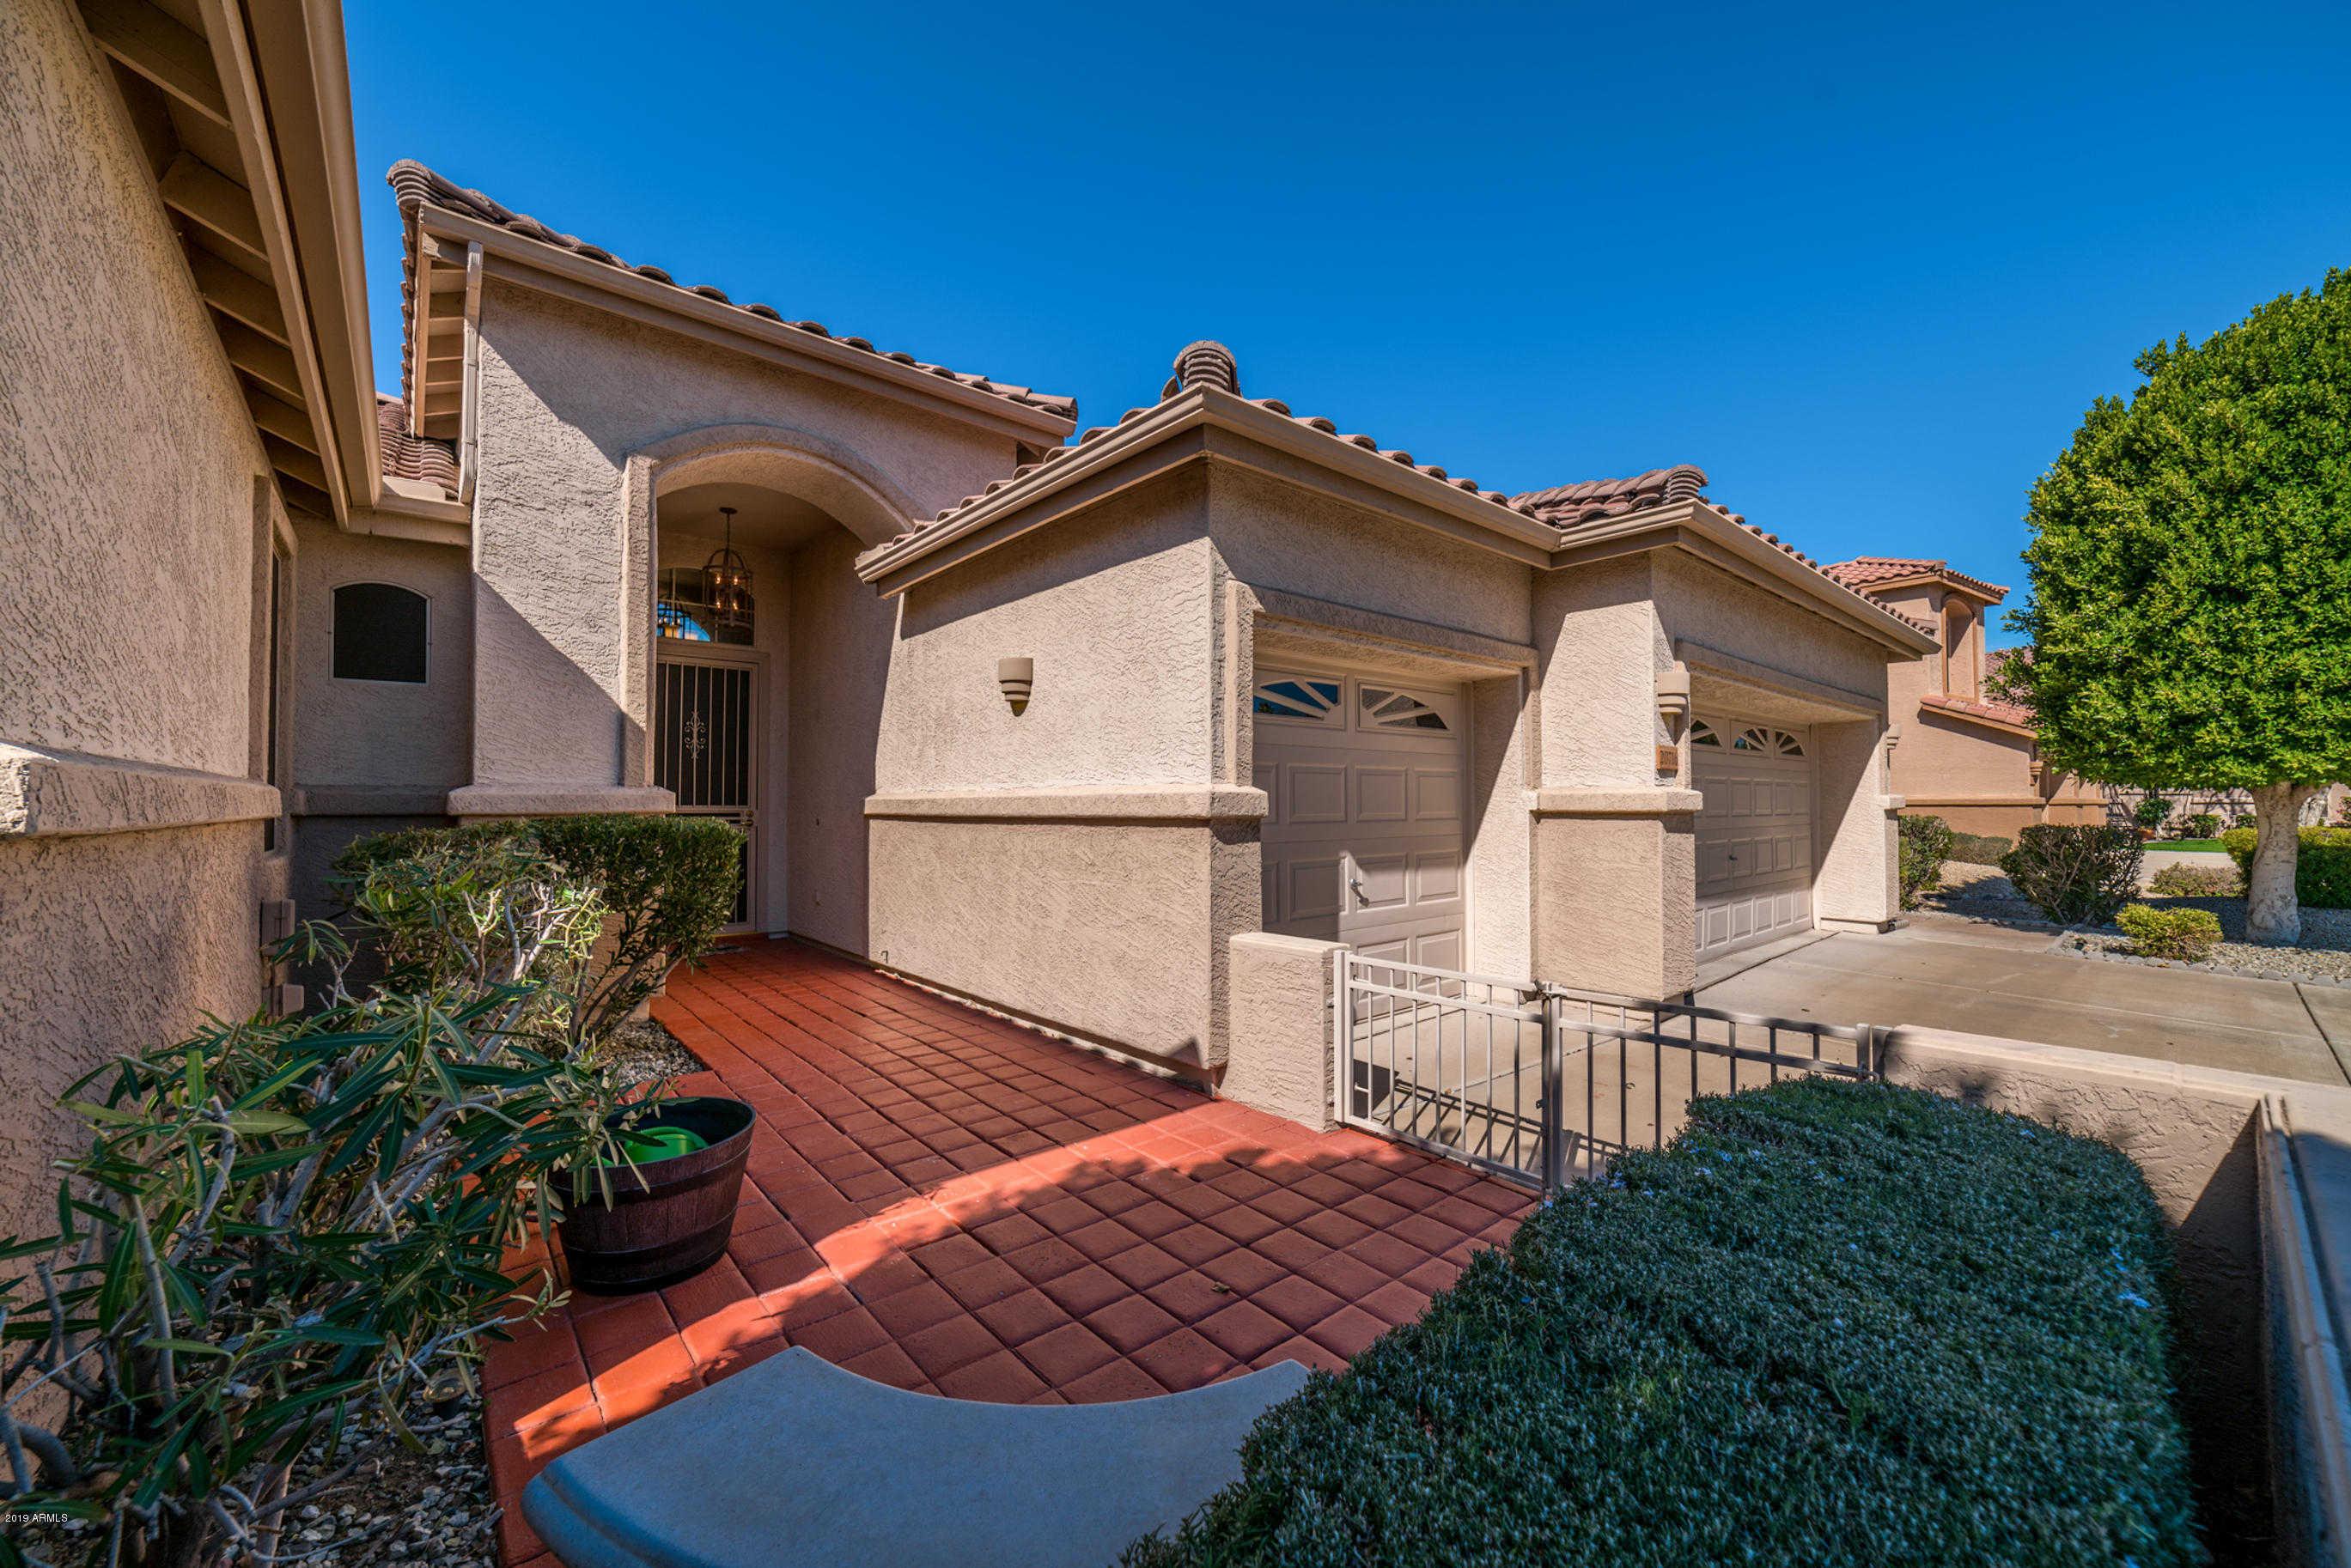 $445,000 - 3Br/2Ba - Home for Sale in Sabino, Glendale